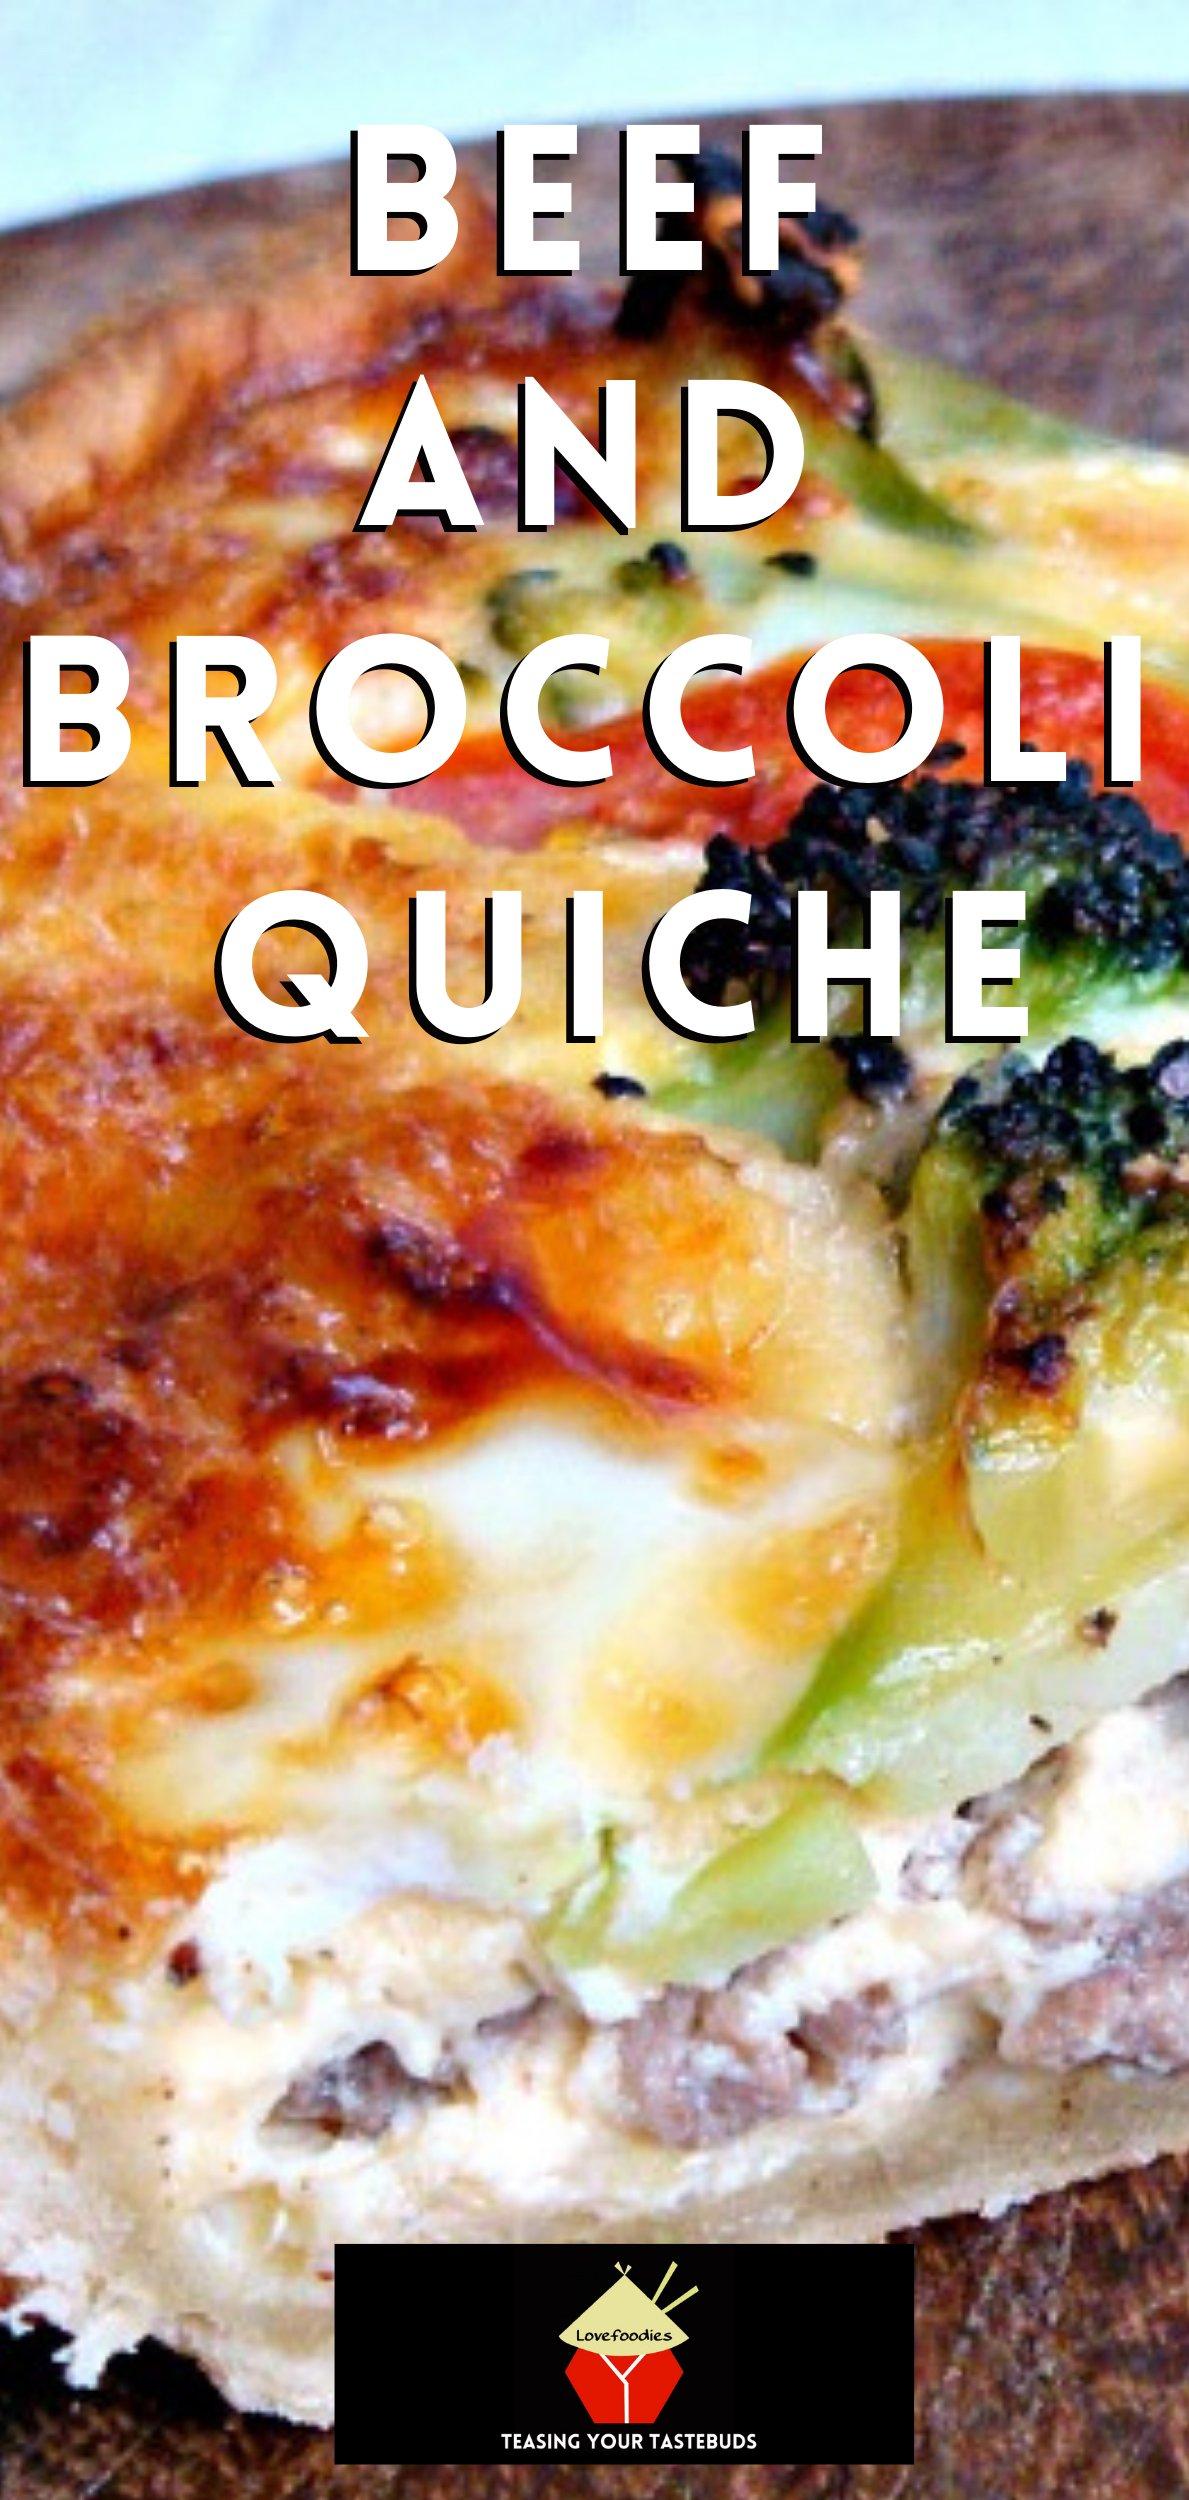 Beef and Broccoli QuicheP3